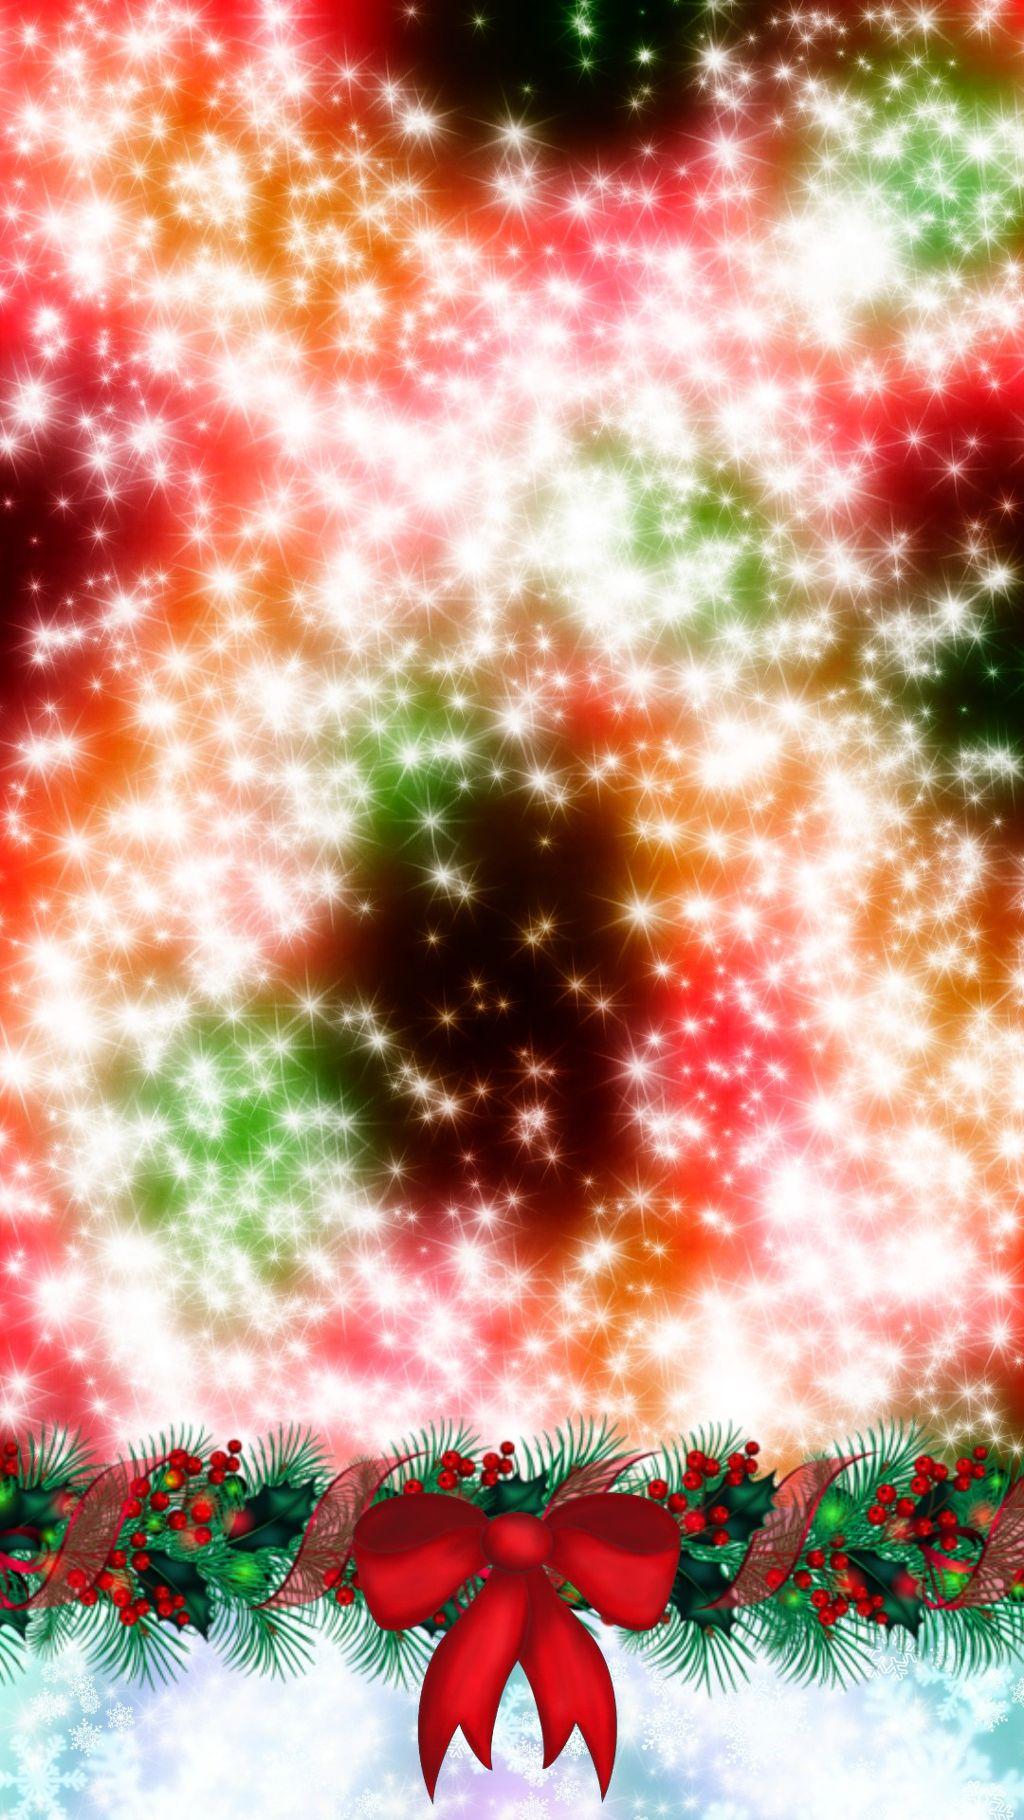 #christmas #homescreen #xmas #wallpaper #galaxy #sparkle - Christmas Ornament - HD Wallpaper